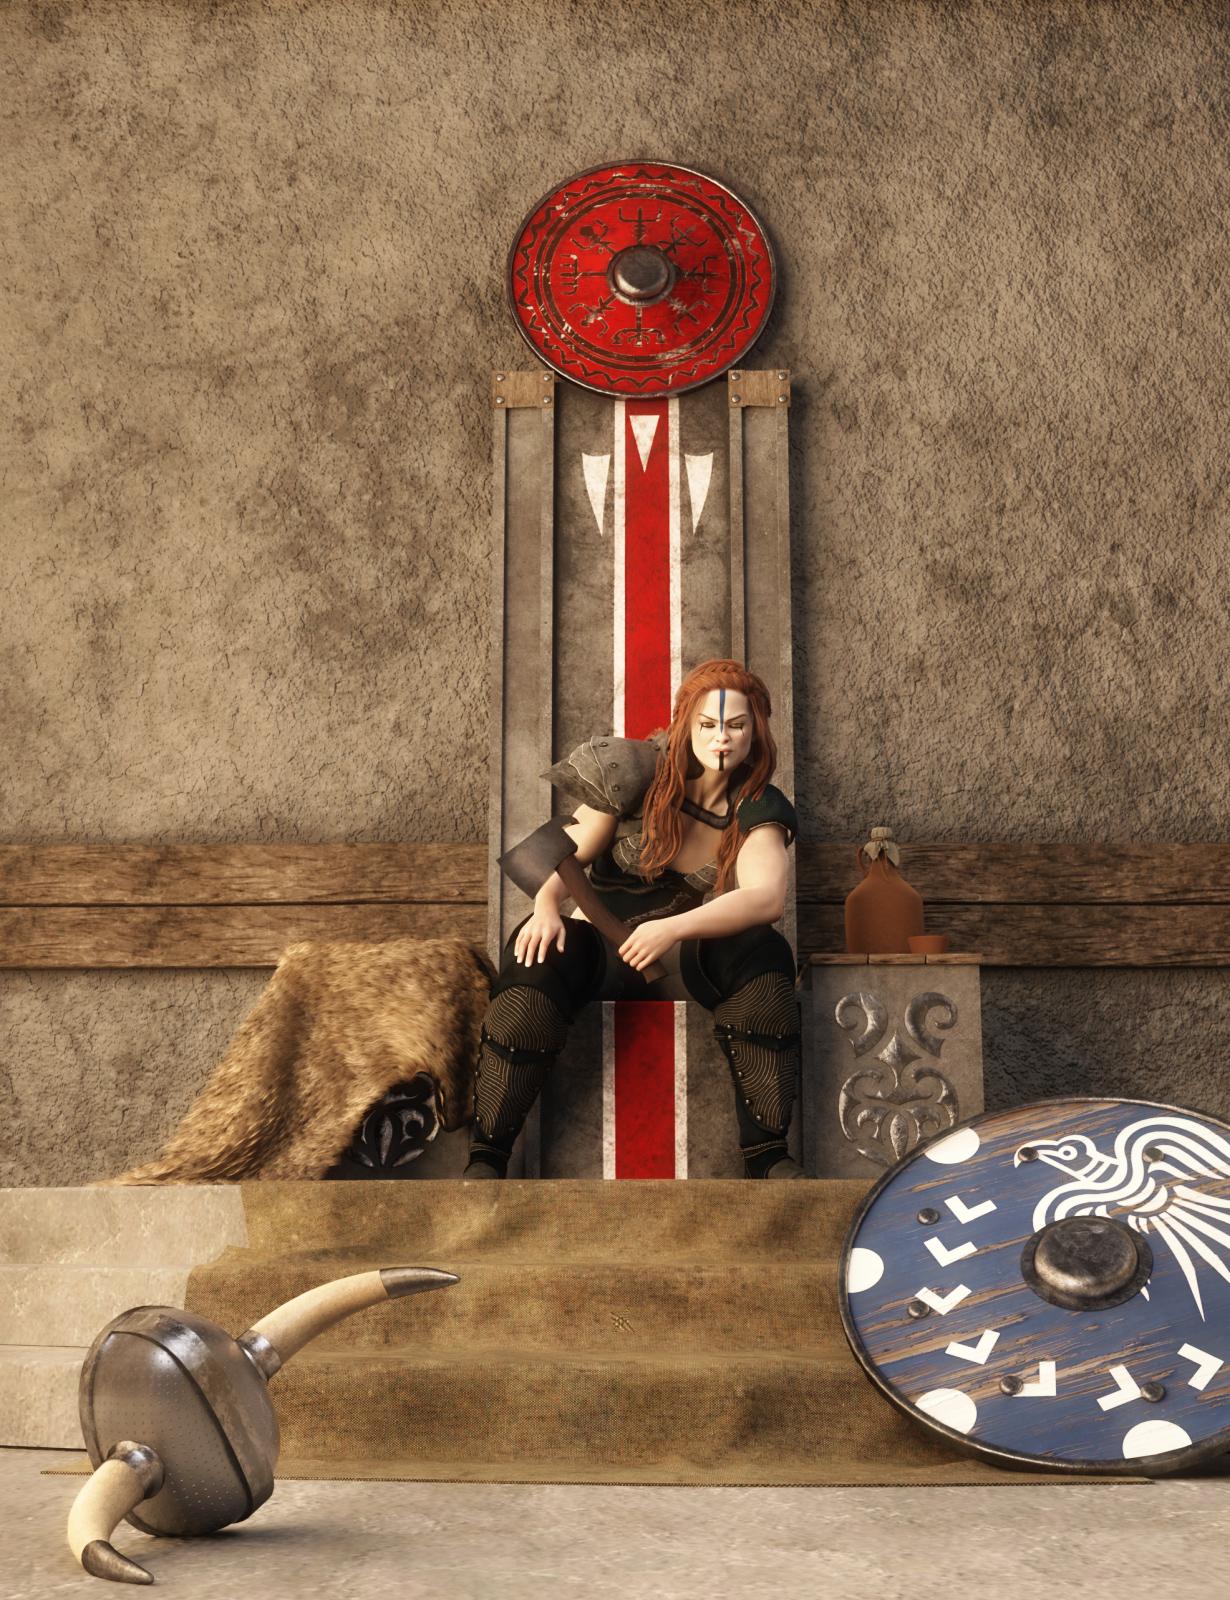 Viking Bundle by: Neikdian, 3D Models by Daz 3D